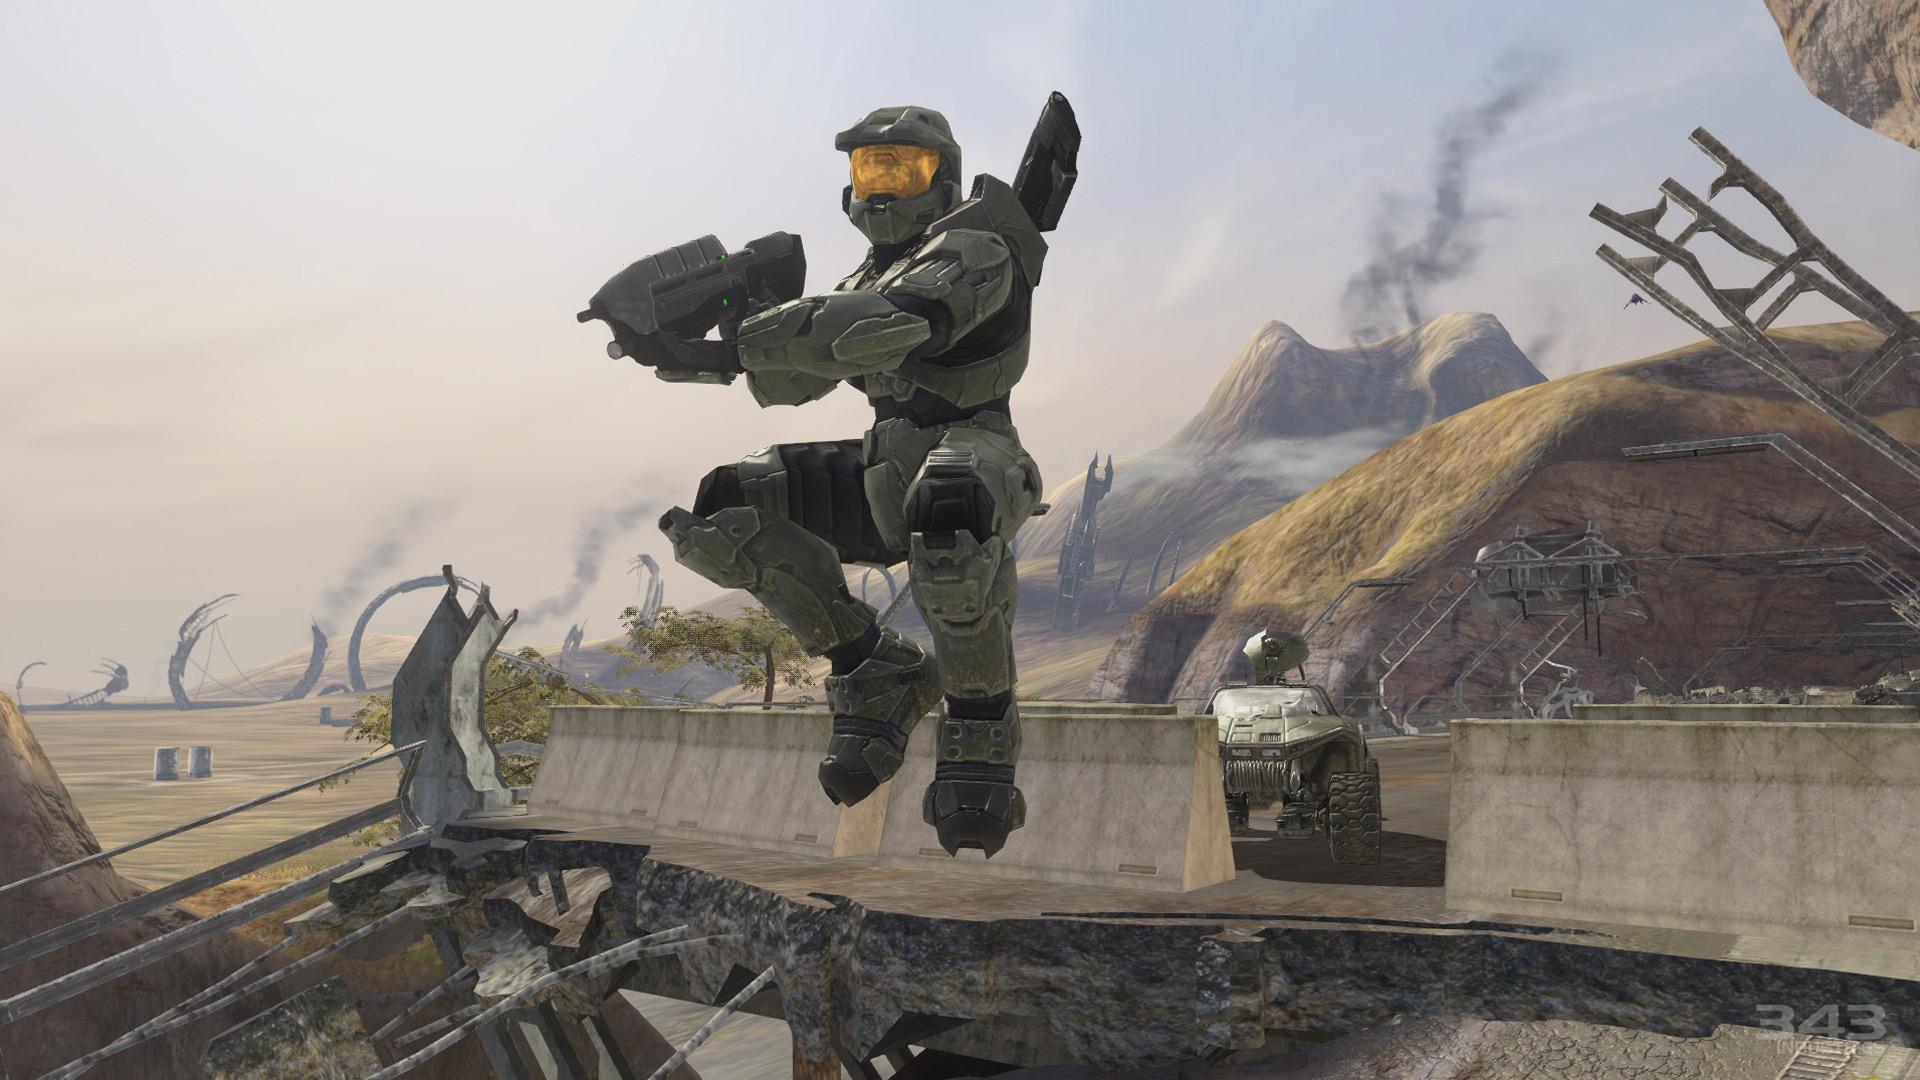 Halo's PC ports won't require Windows 10 screenshot